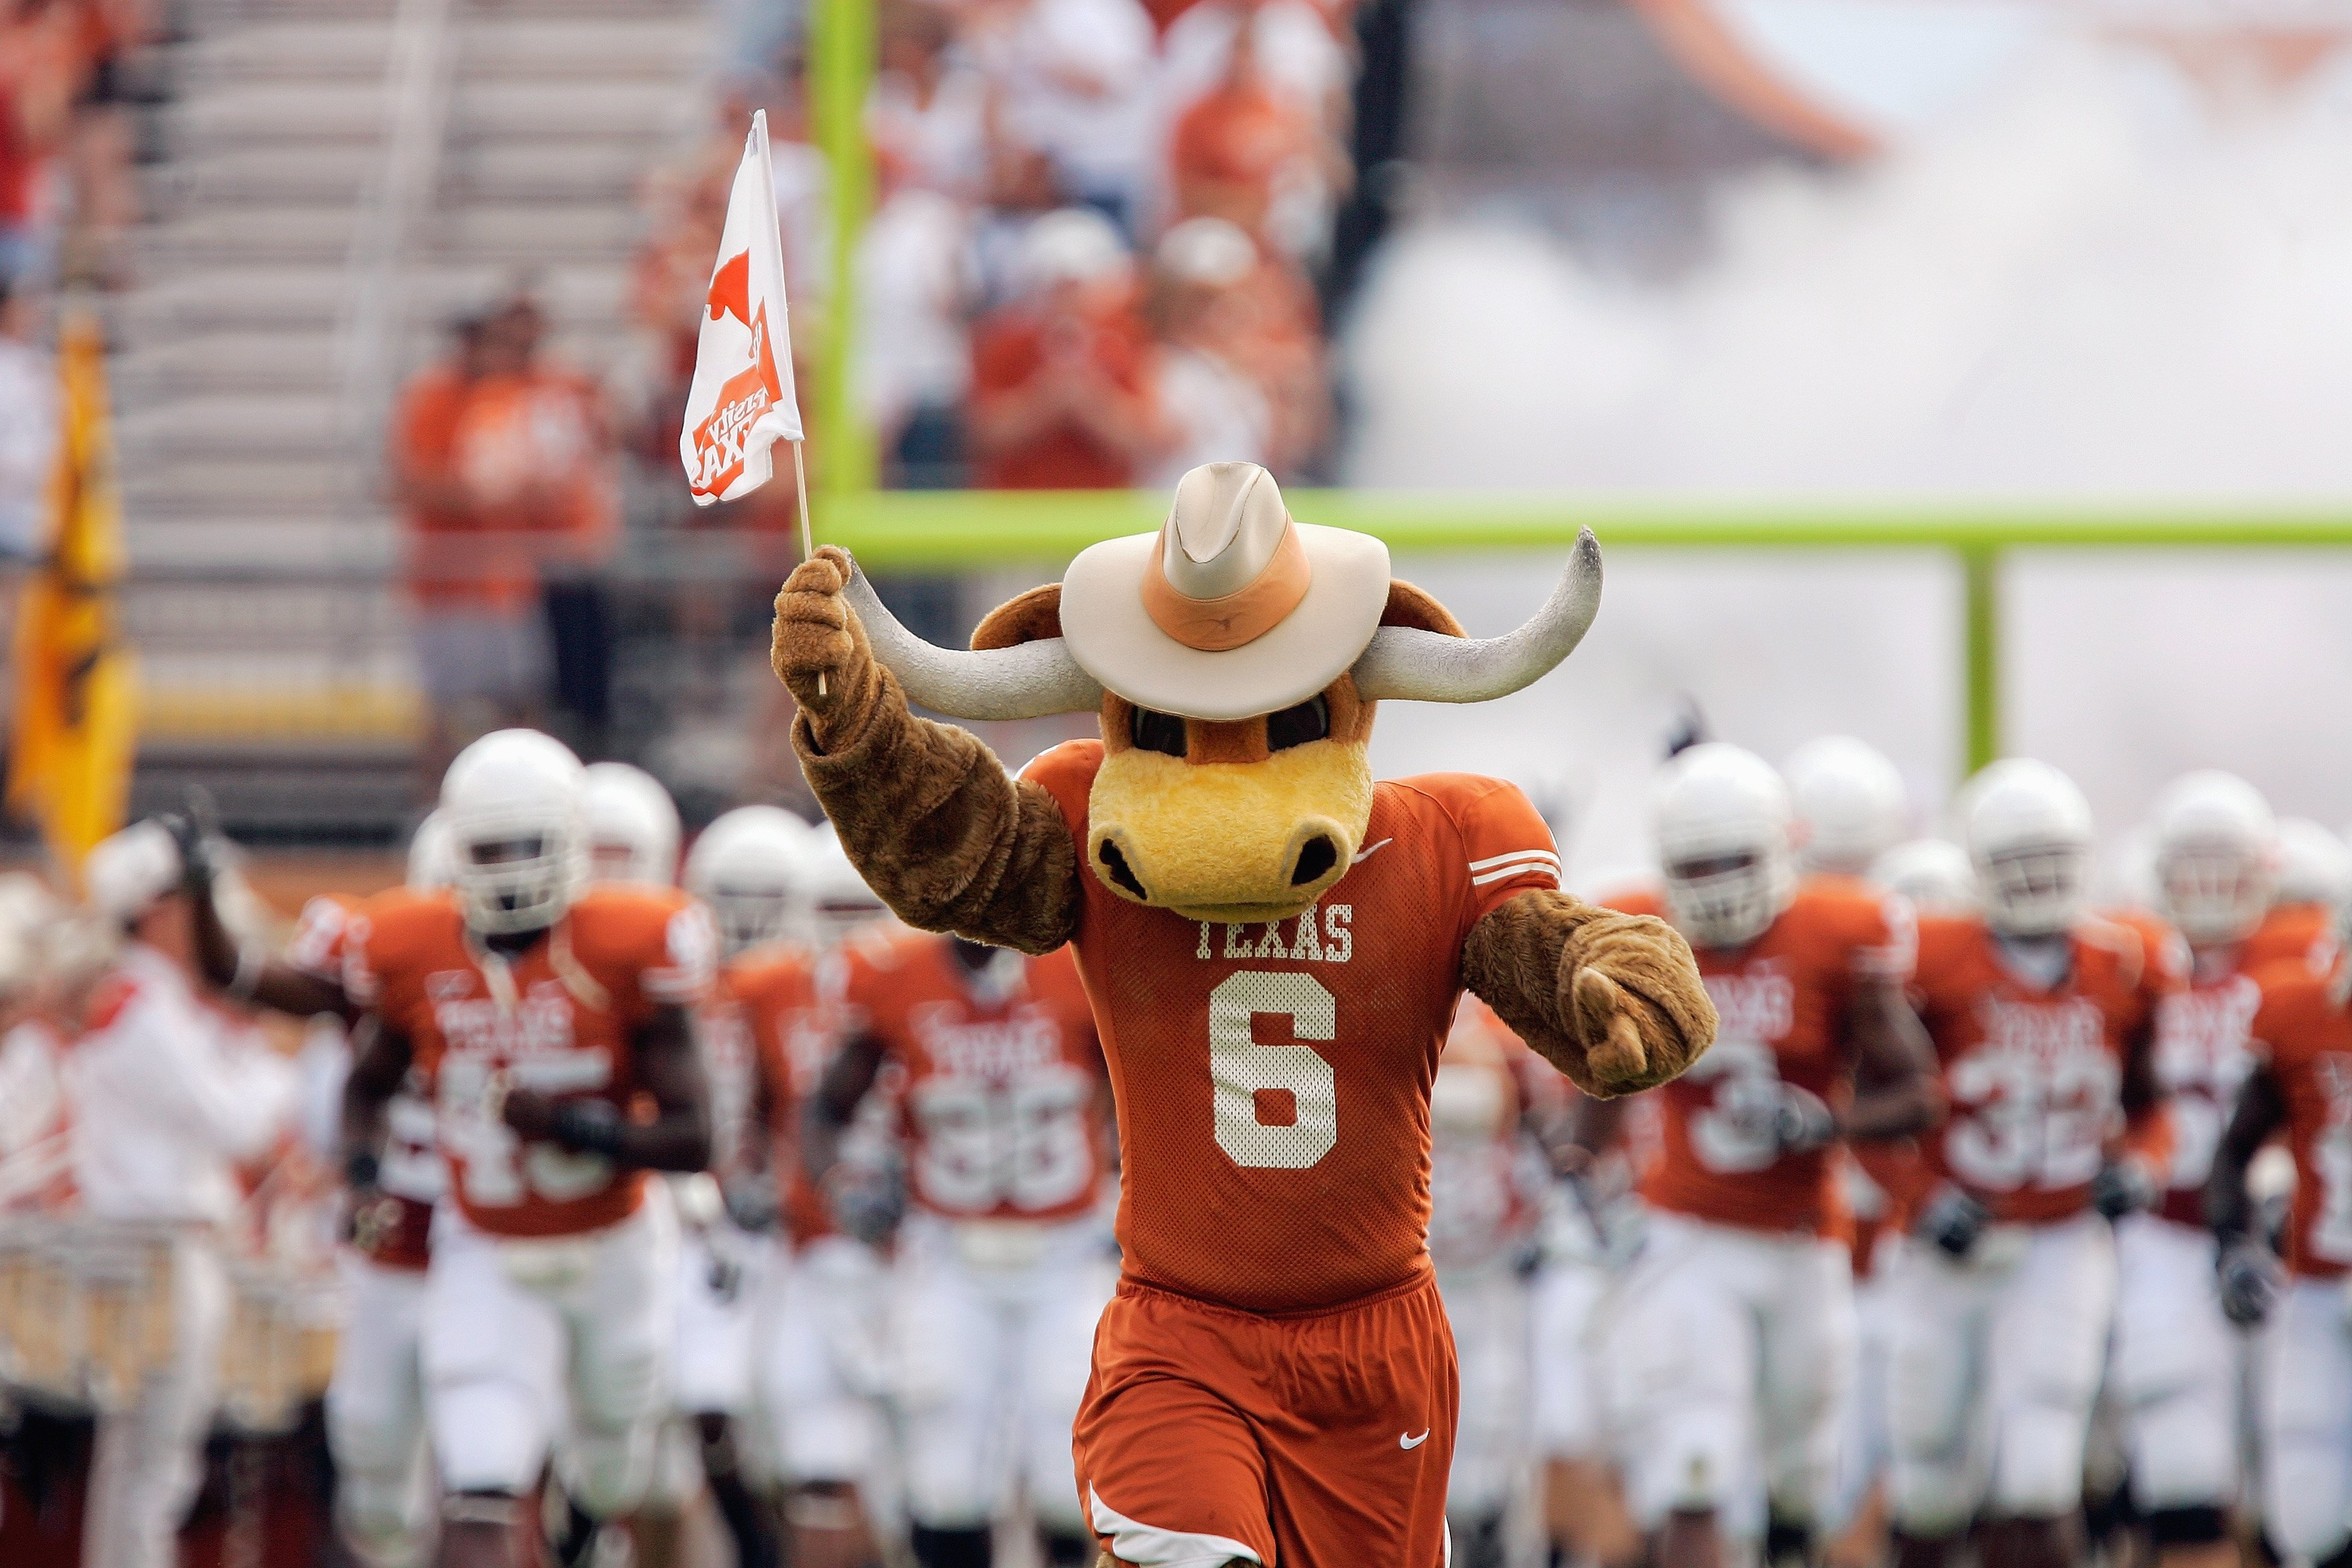 AUSTIN, TX - SEPTEMBER 27:  The Texas Longhorns mascot leads the team onto the field before the game against the Arkansas Razorbacks on September 27, 2008 at Darrell K Royal-Texas Memorial Stadium in Austin, Texas.  Texas won 52-10.  (Photo by Brian Bahr/